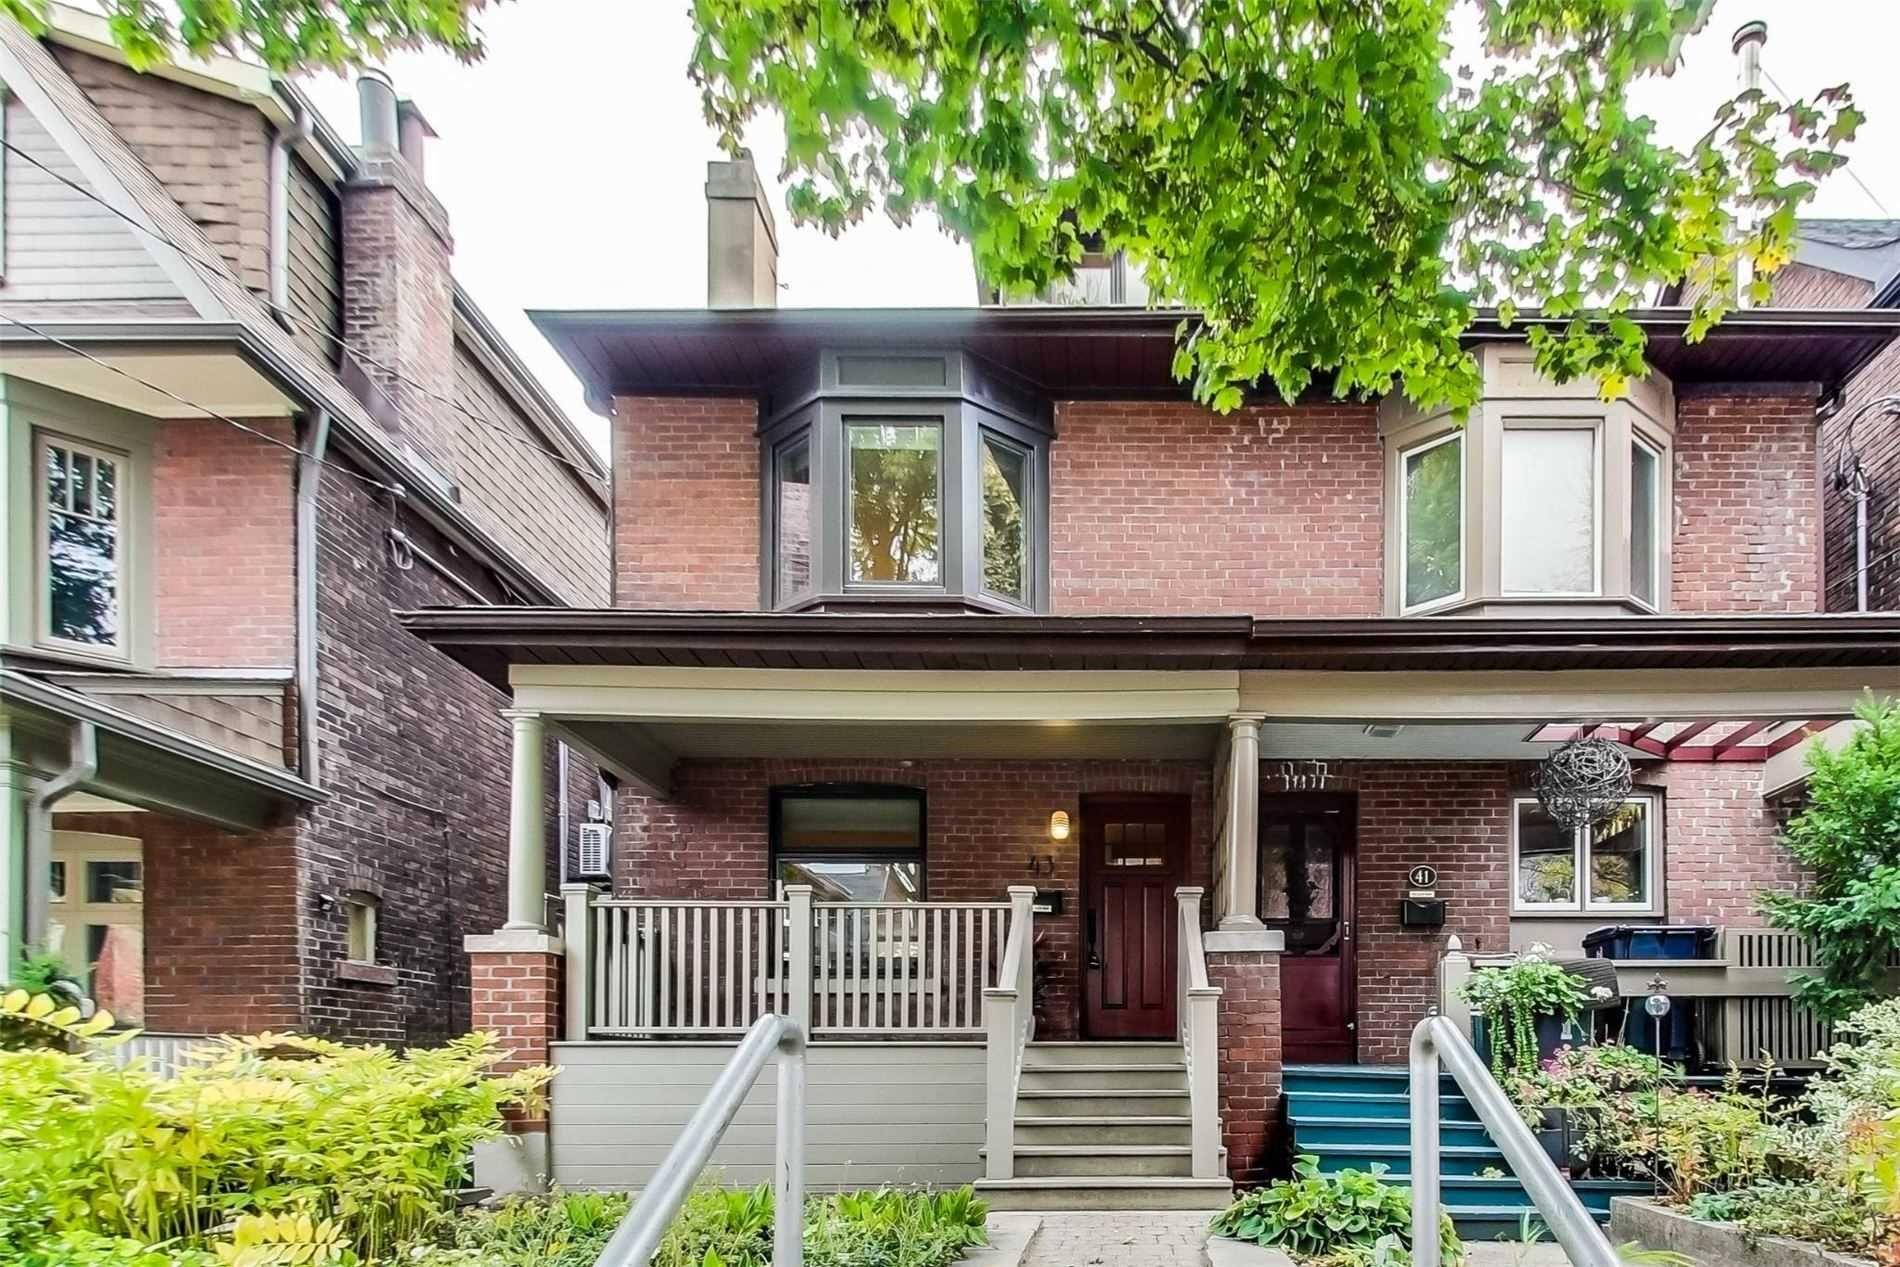 Main Photo: 43 Sparkhall Avenue in Toronto: North Riverdale House (3-Storey) for sale (Toronto E01)  : MLS®# E4976542